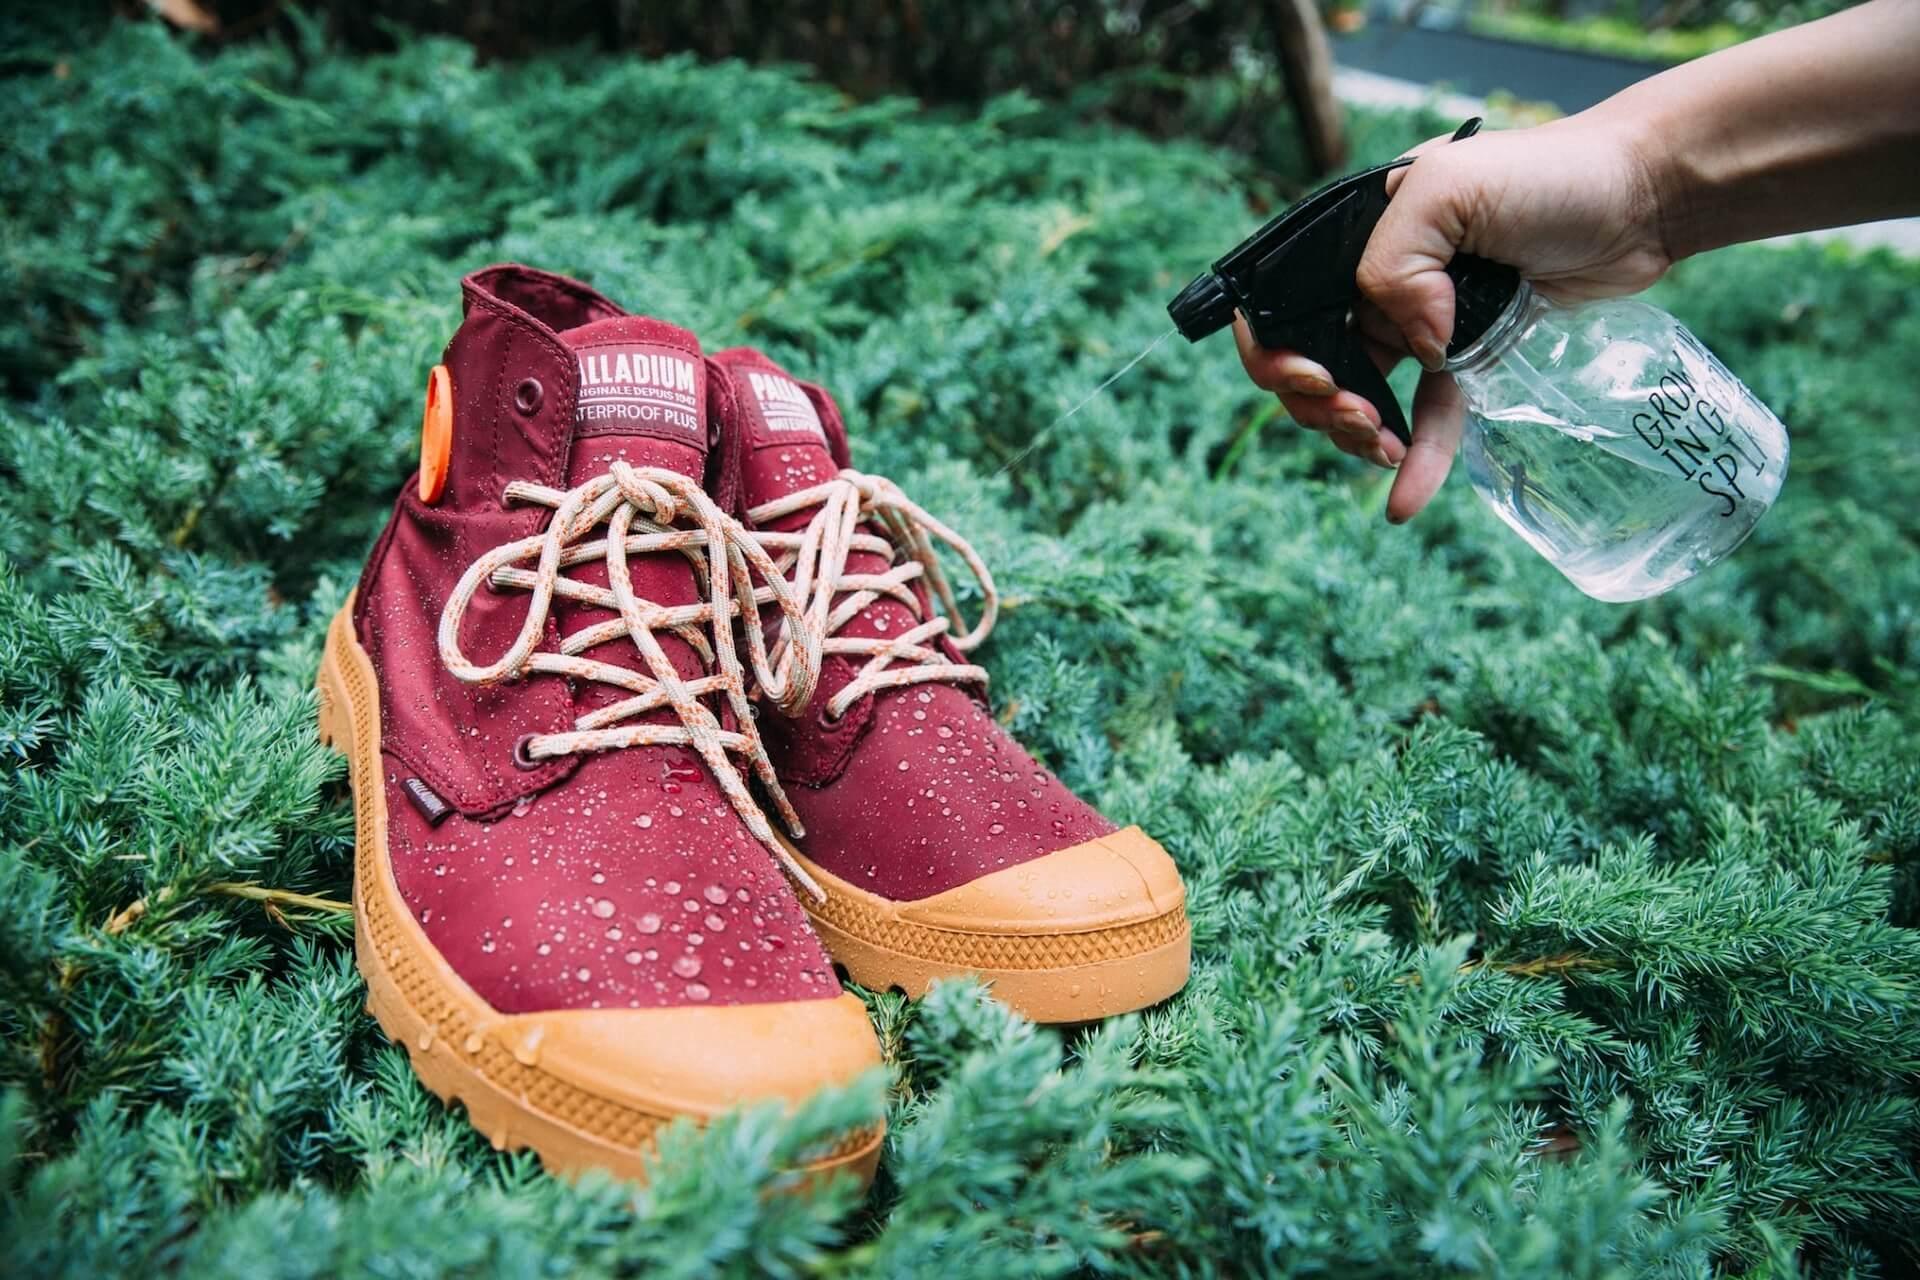 PALLADIUM徹底解剖|雨の日やアウトドア/フェスで大活躍するおしゃれな防水靴の秘密 life-fashion190704-palladium-9